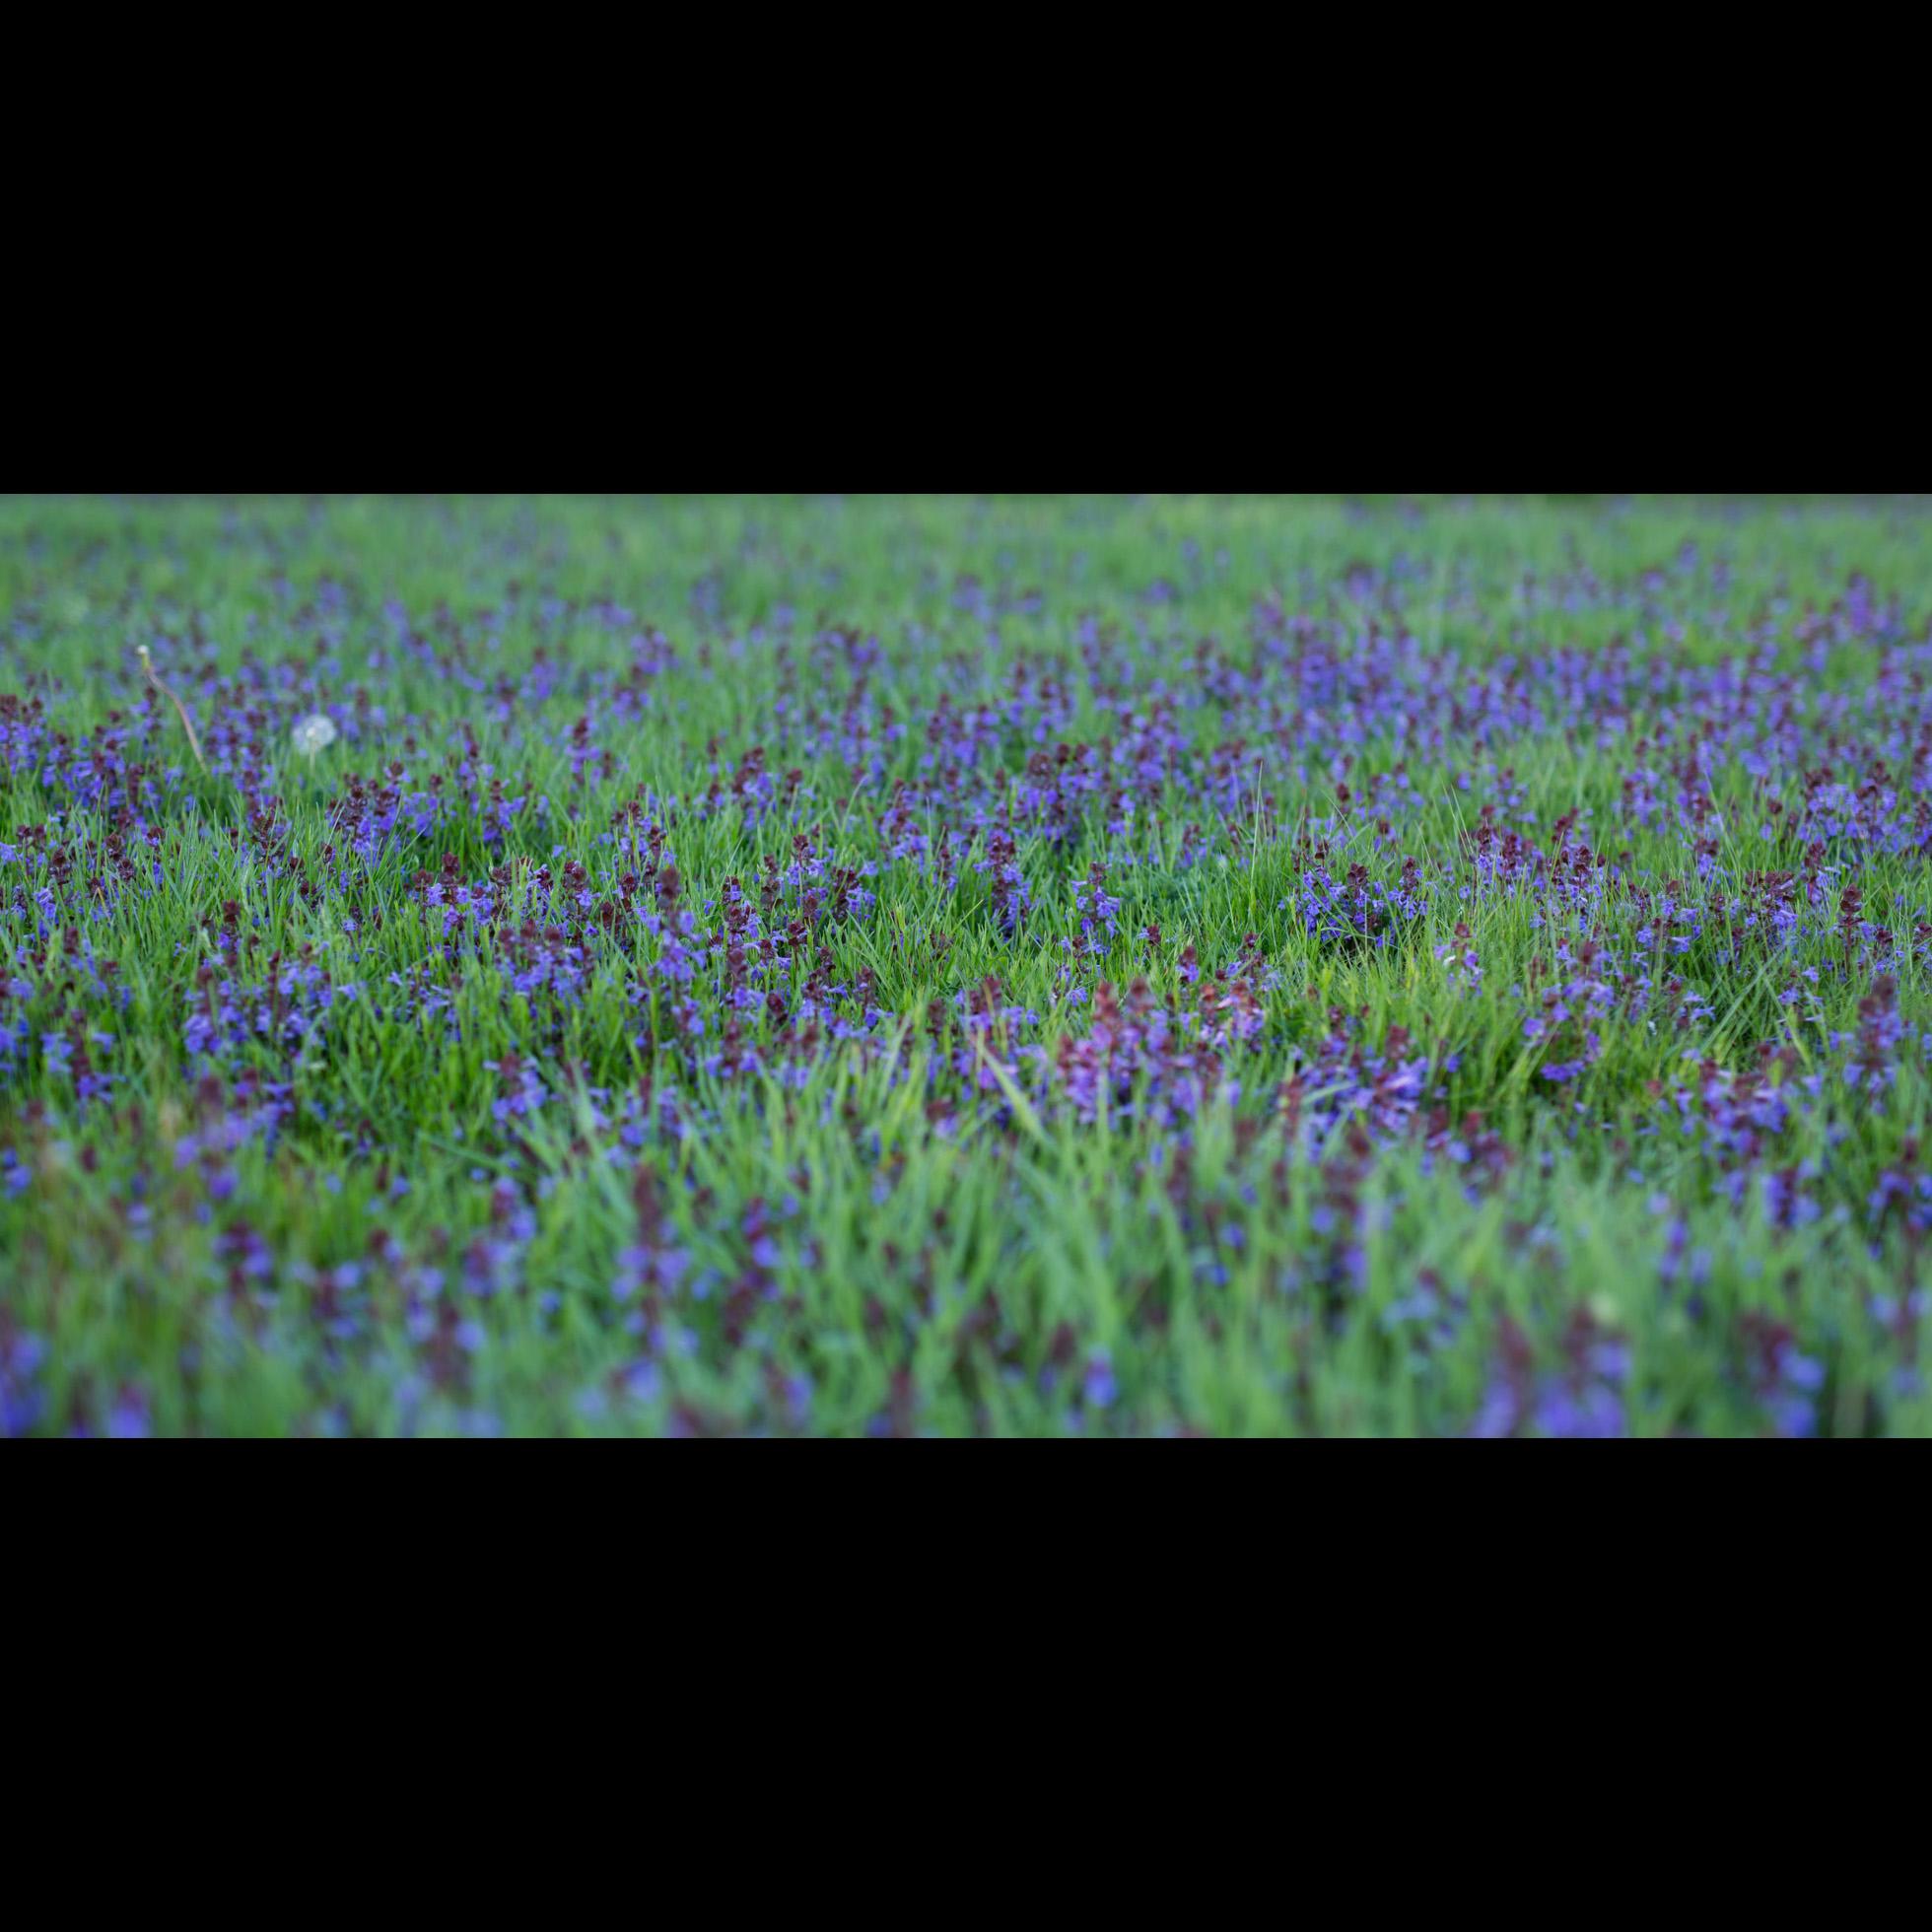 5.8 PURPLE FLOWERS